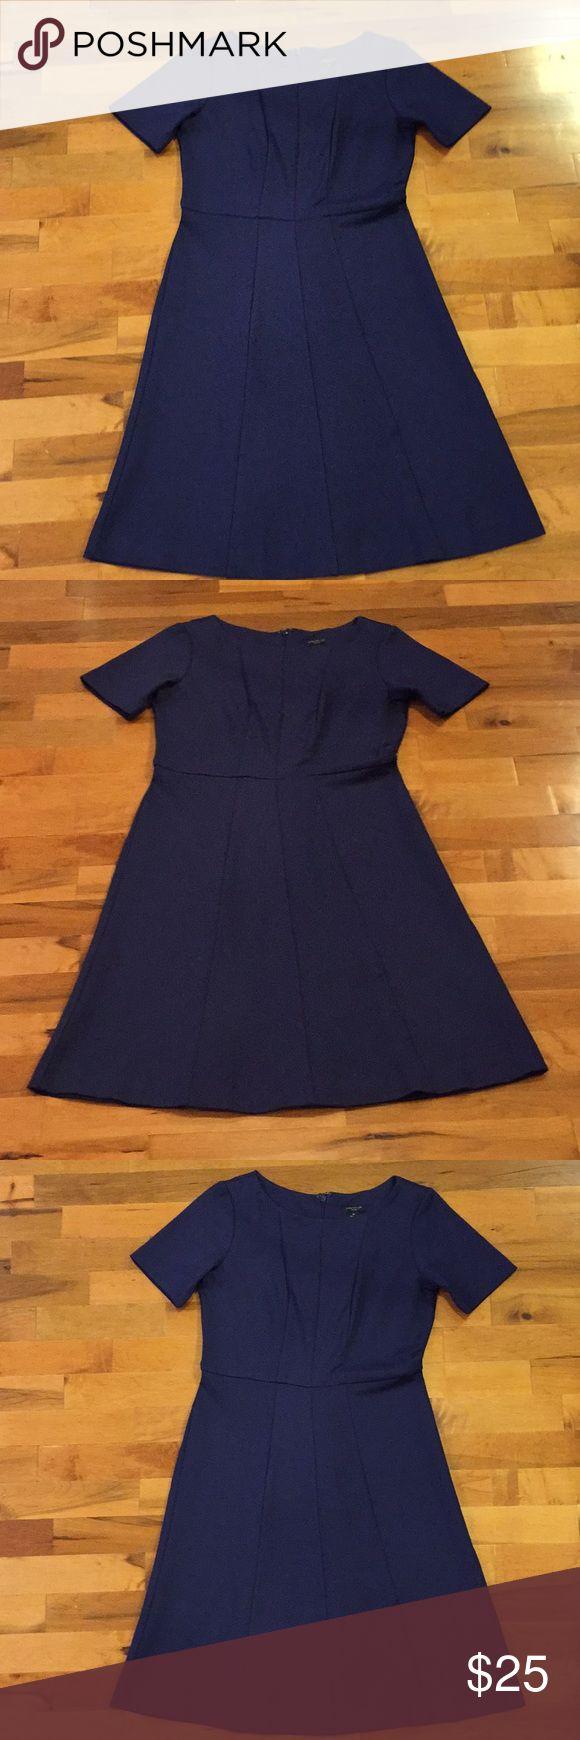 Ann Taylor Dress Navy Petite Dress Ann Taylor Dresses